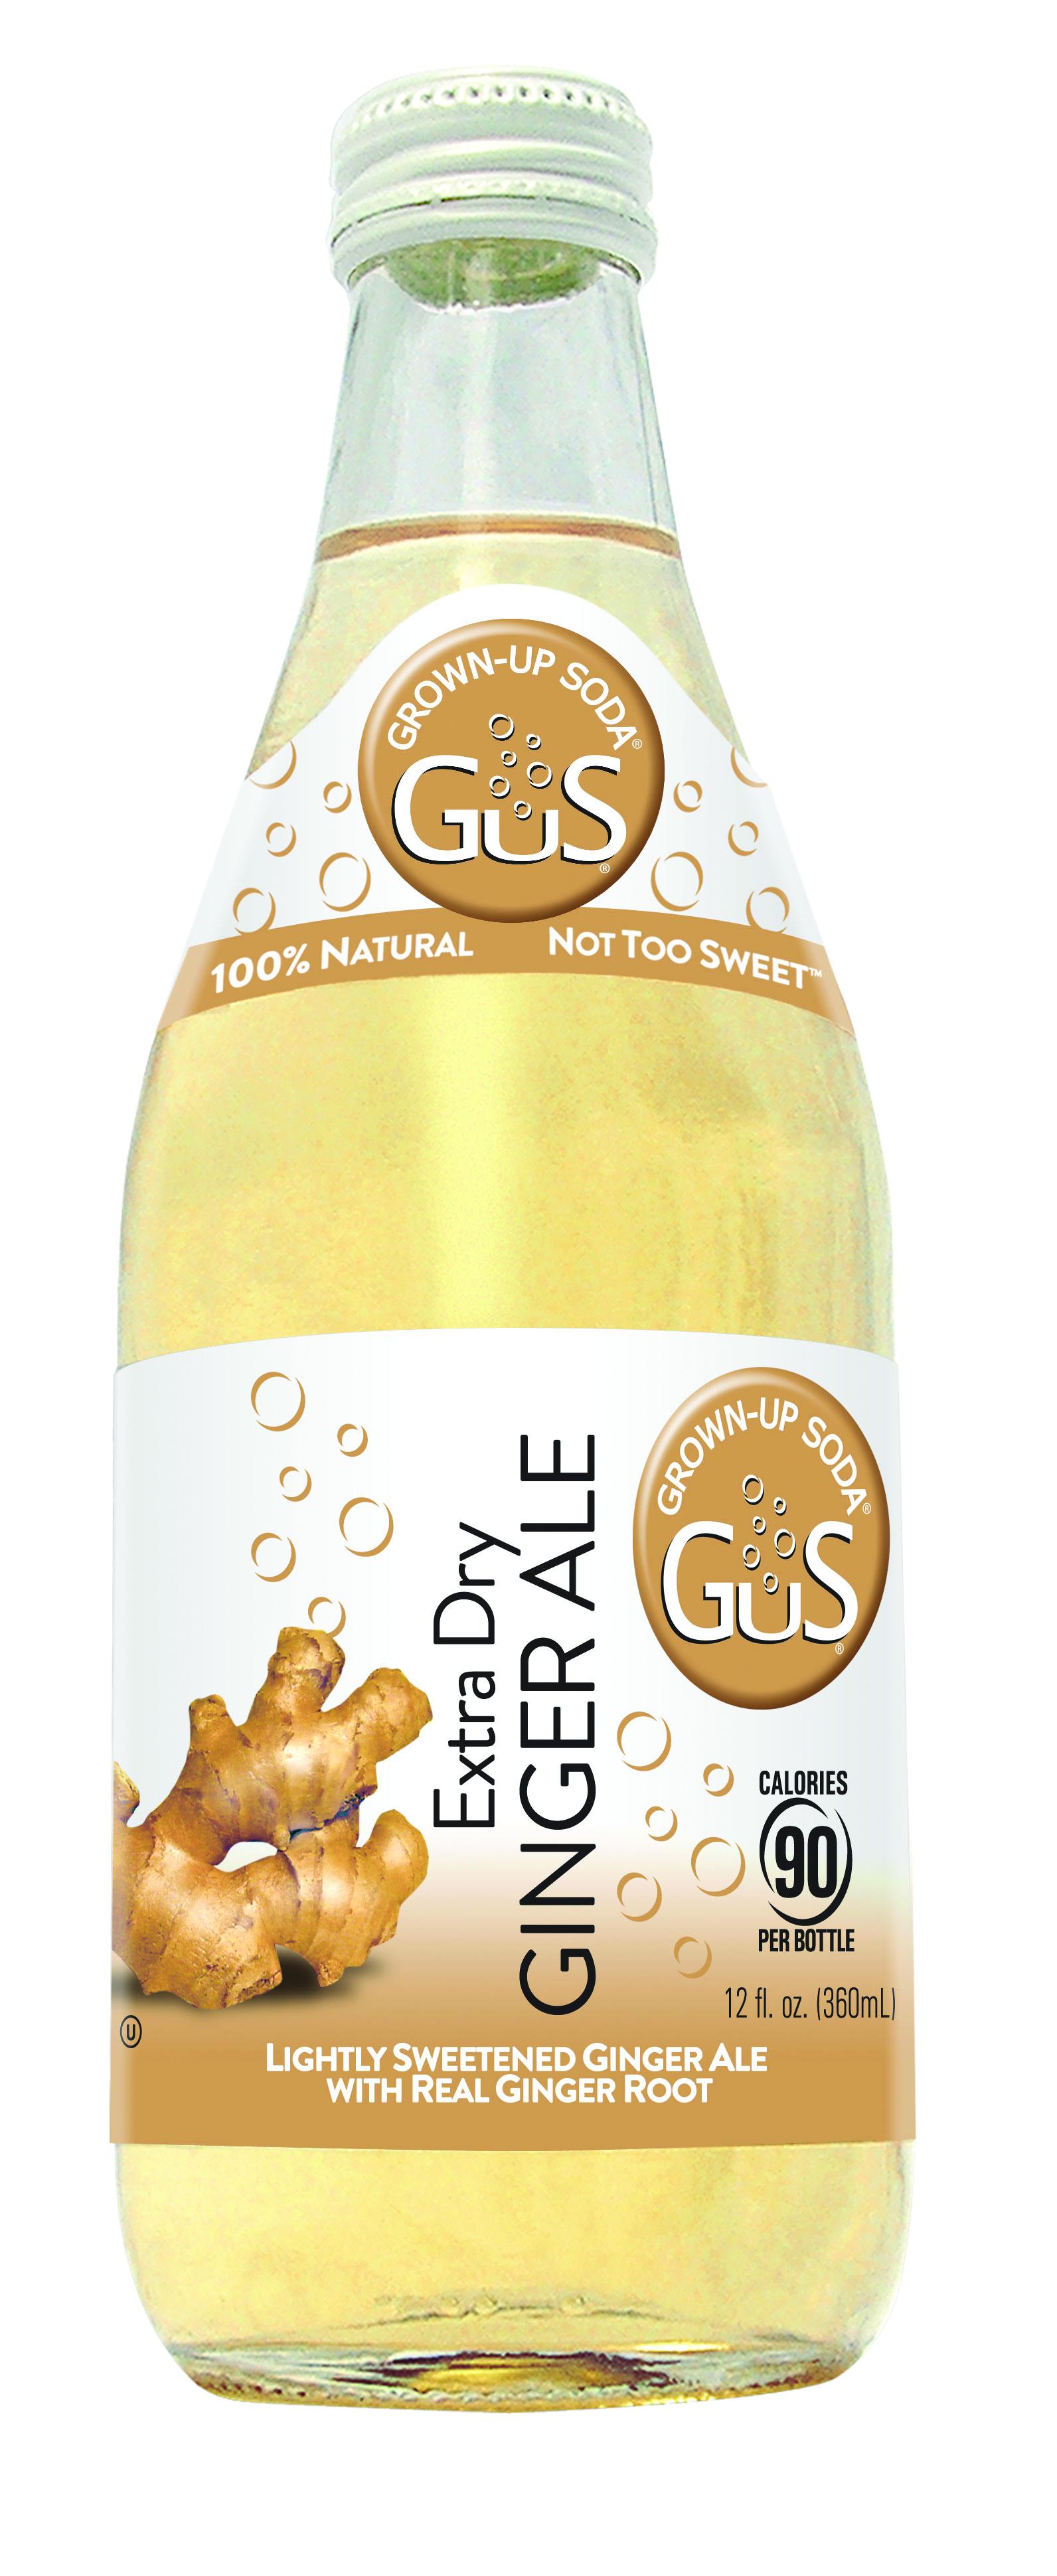 GuS Soda Ginger Ale bottle